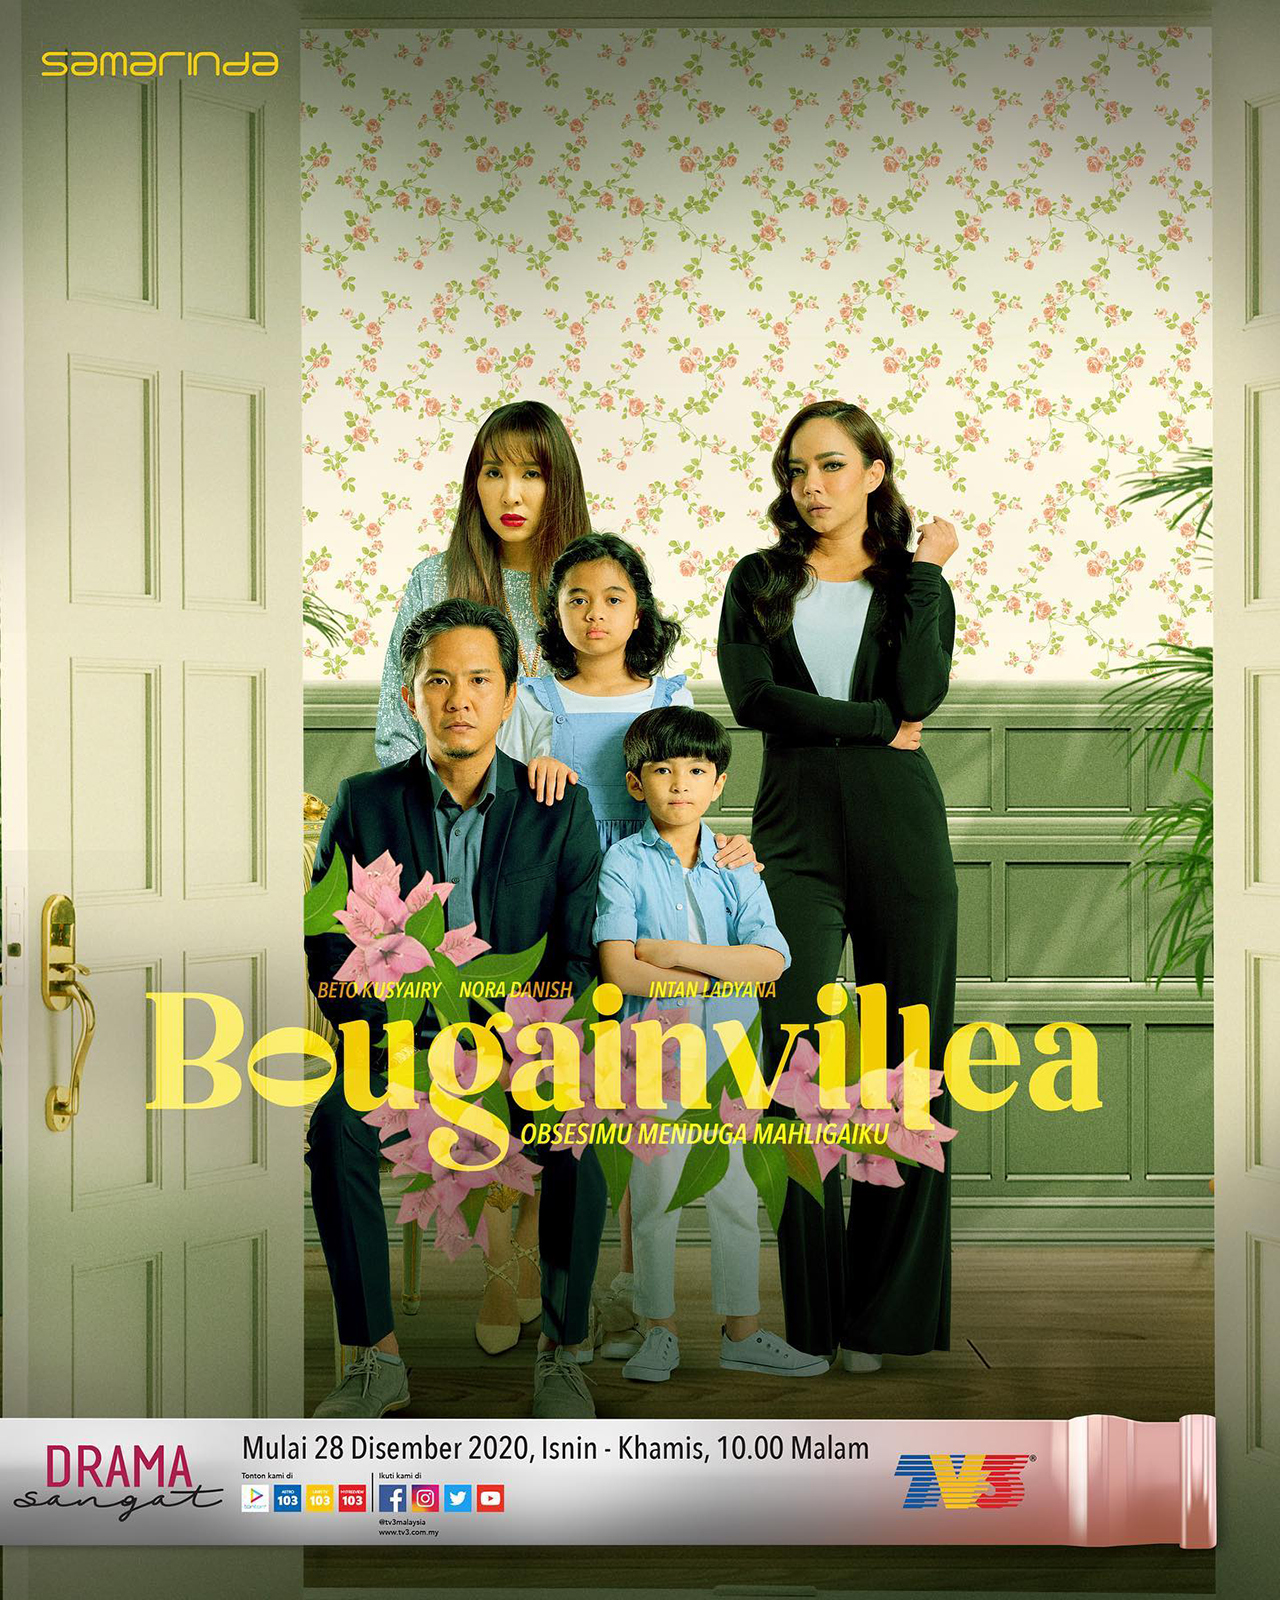 Drama Bougainvillea Episod 1-15(Akhir) Lakonan Beto Kusyairy dan Intan Ladyana